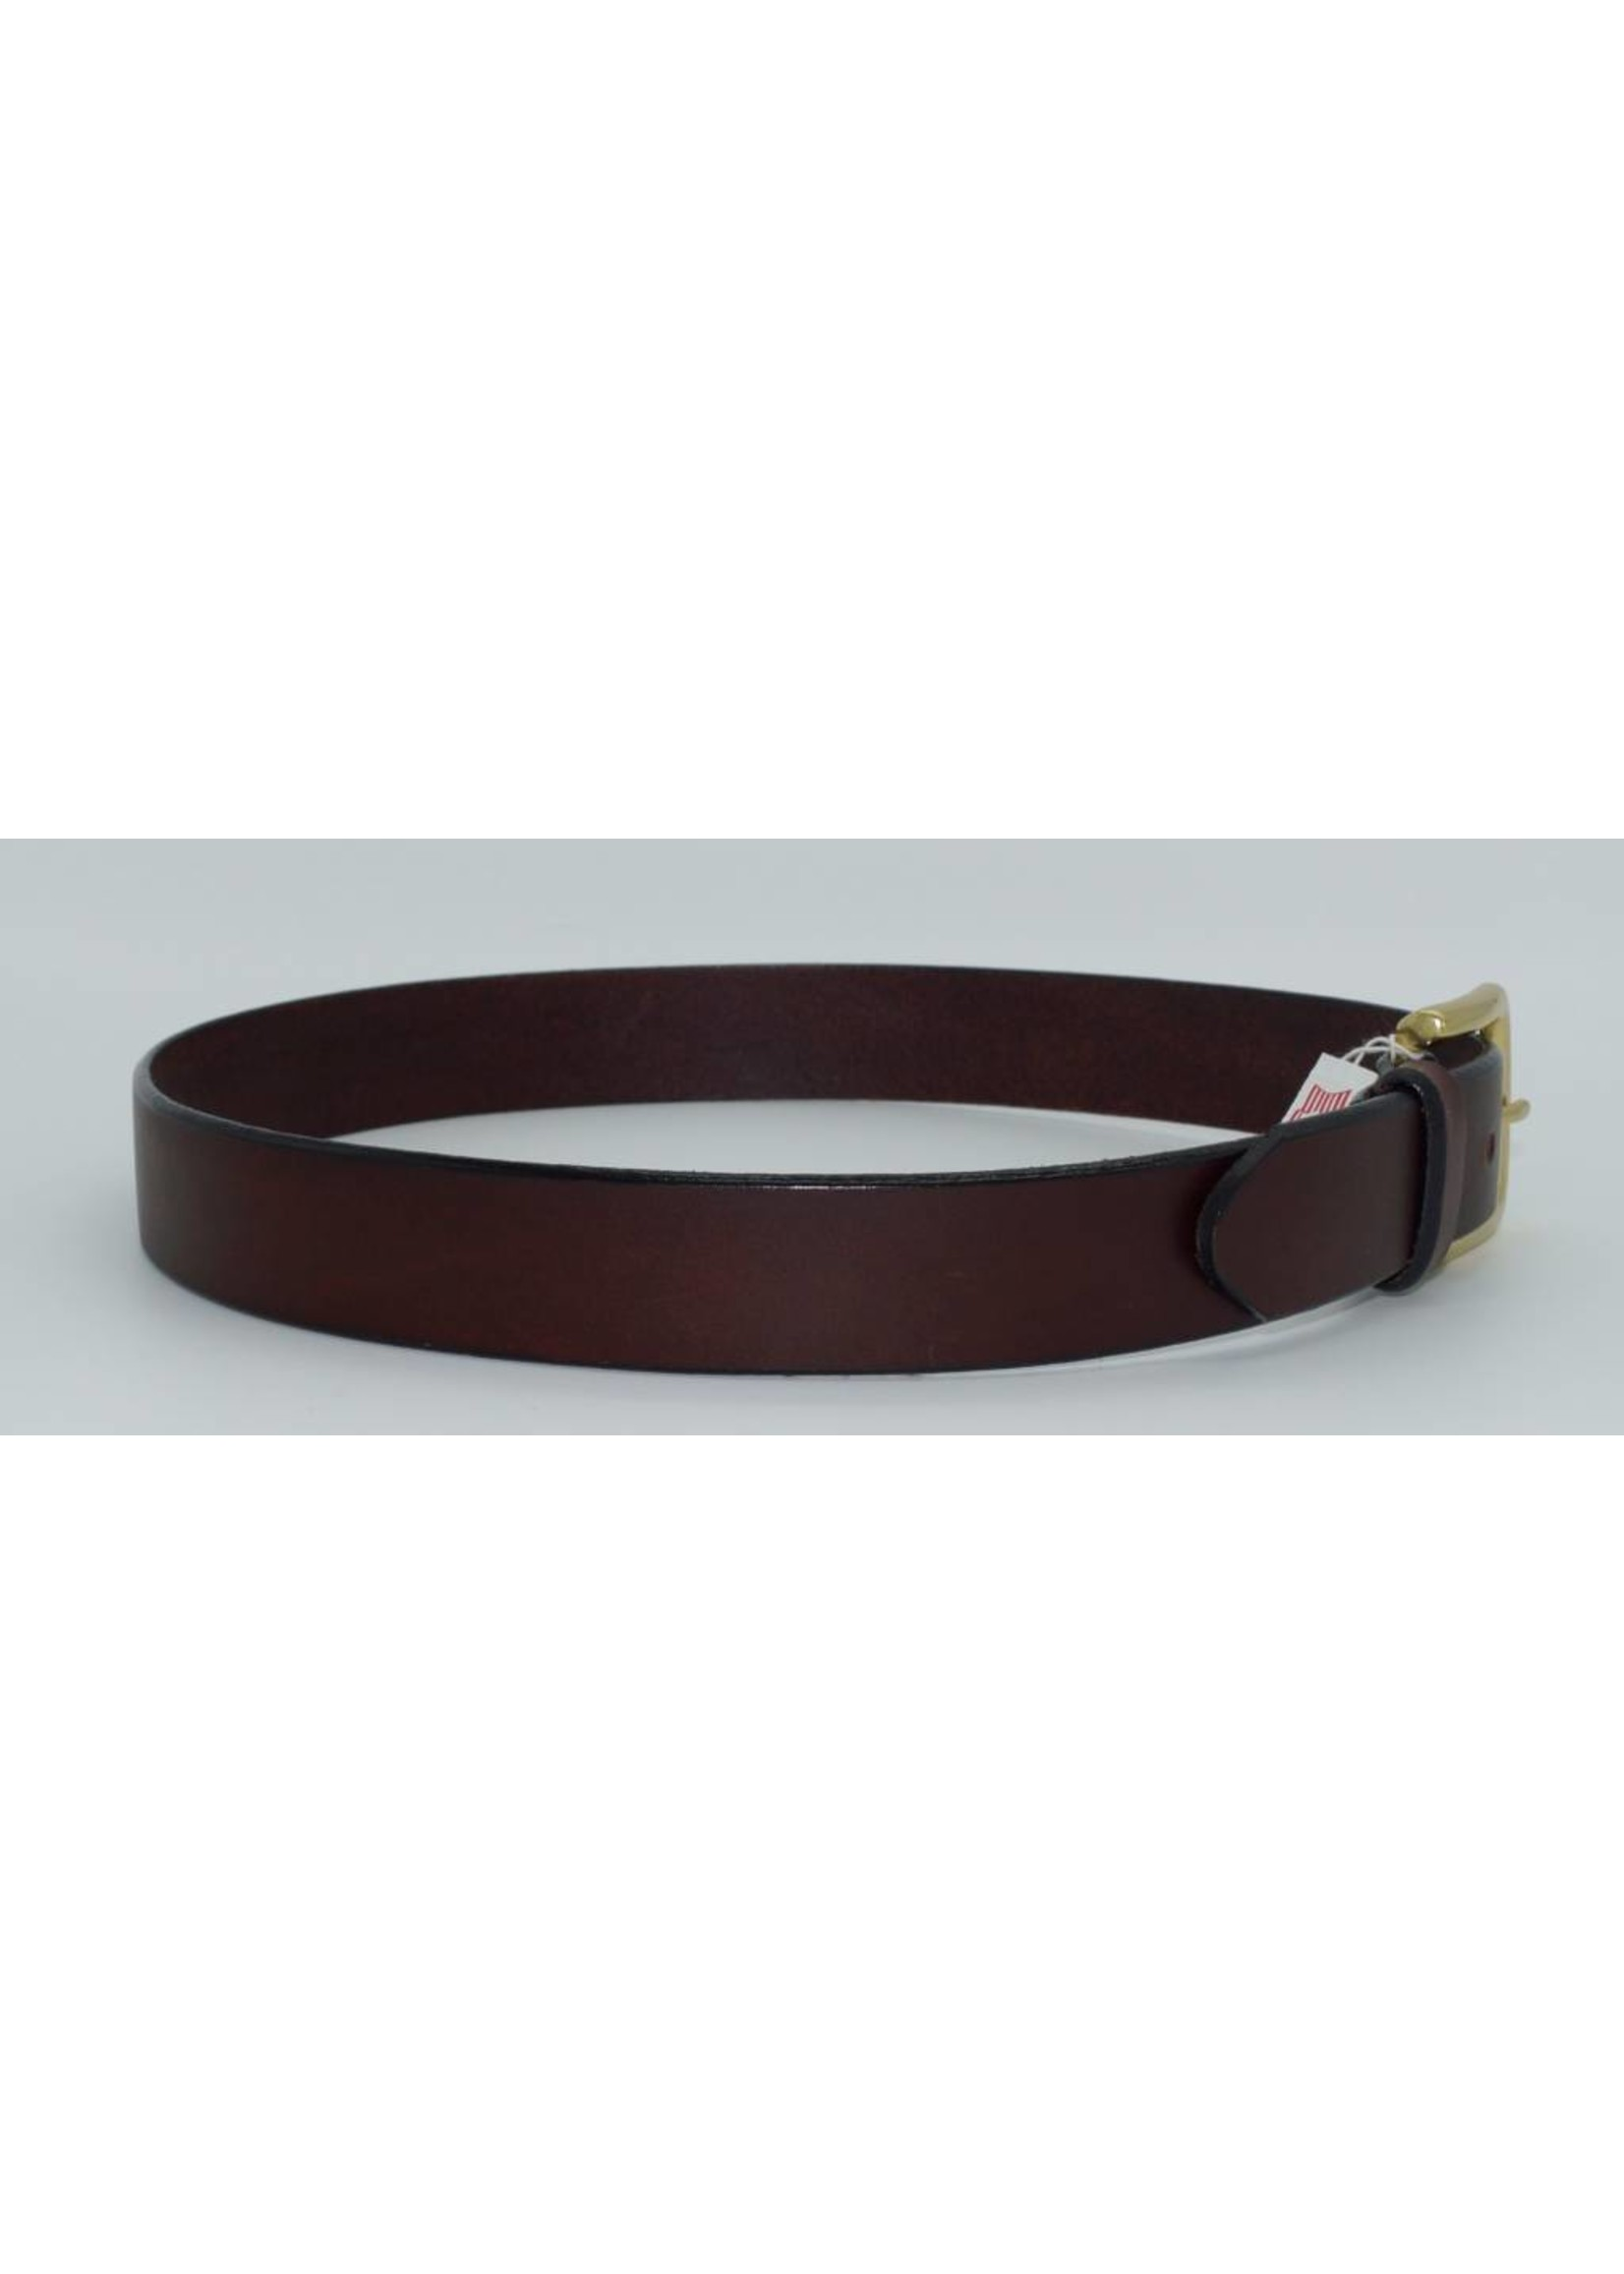 Leegin Leegin English Bevel Belt Brown 21807